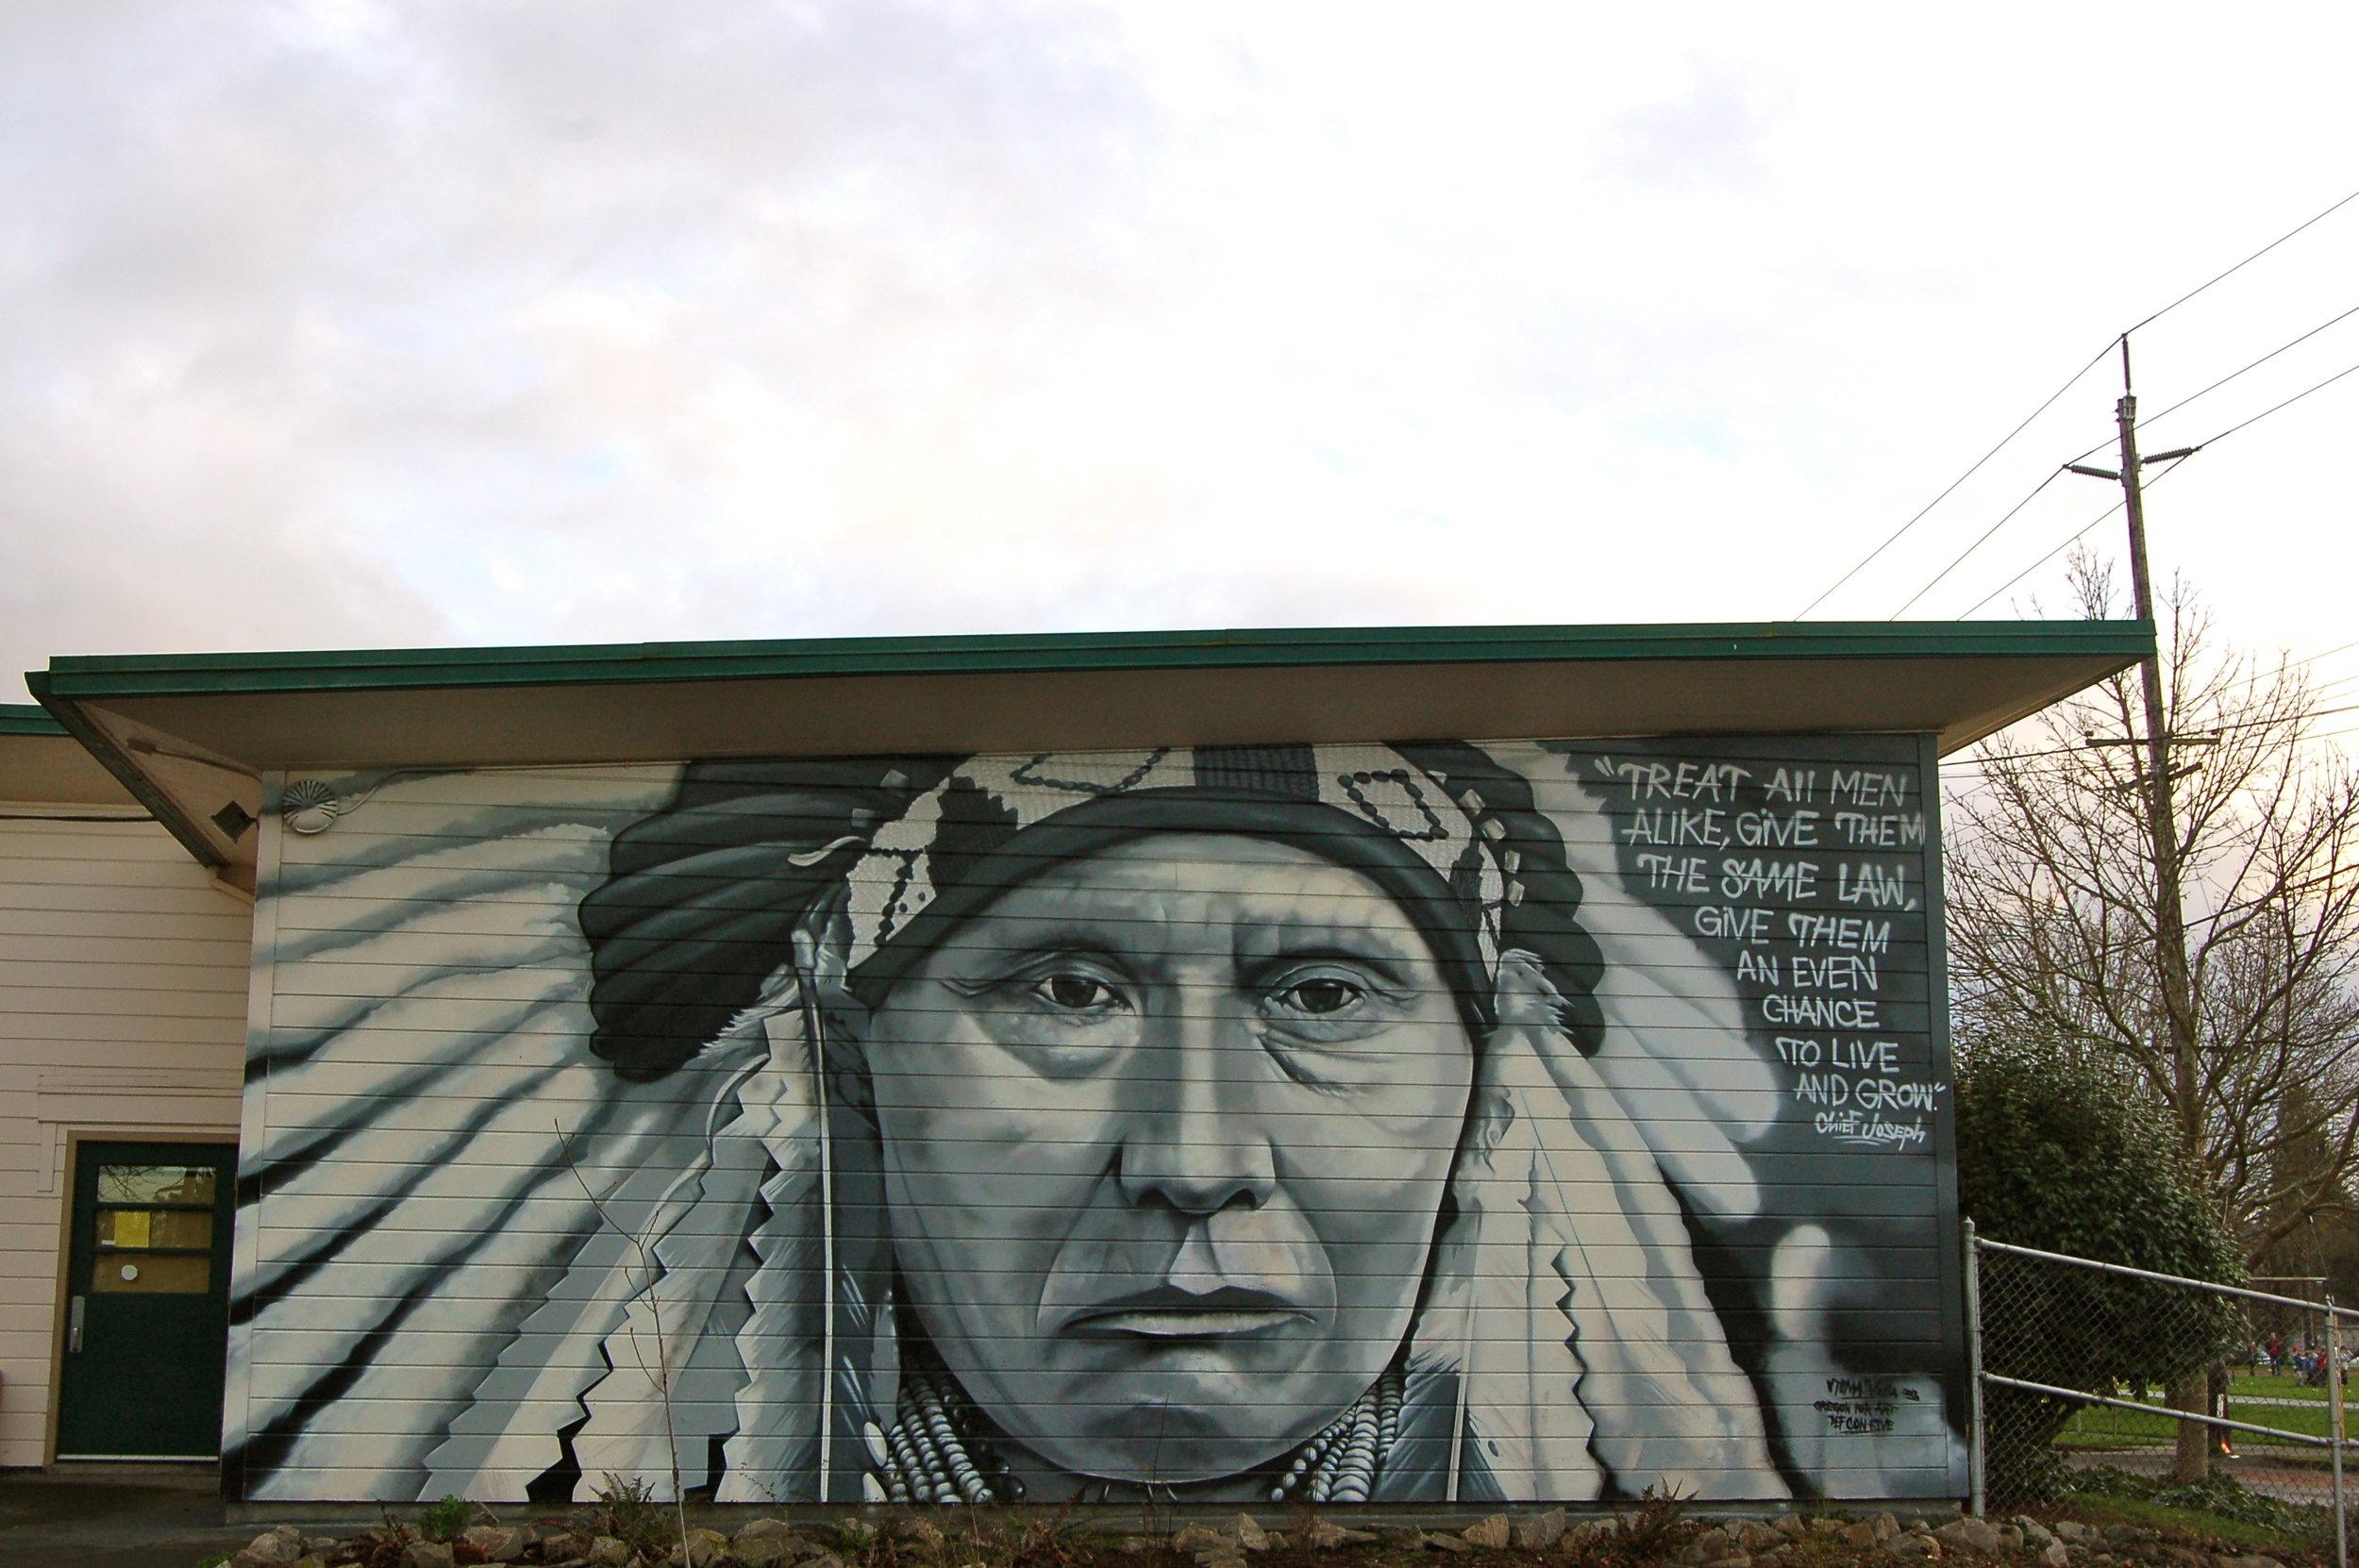 Chief Jospeh